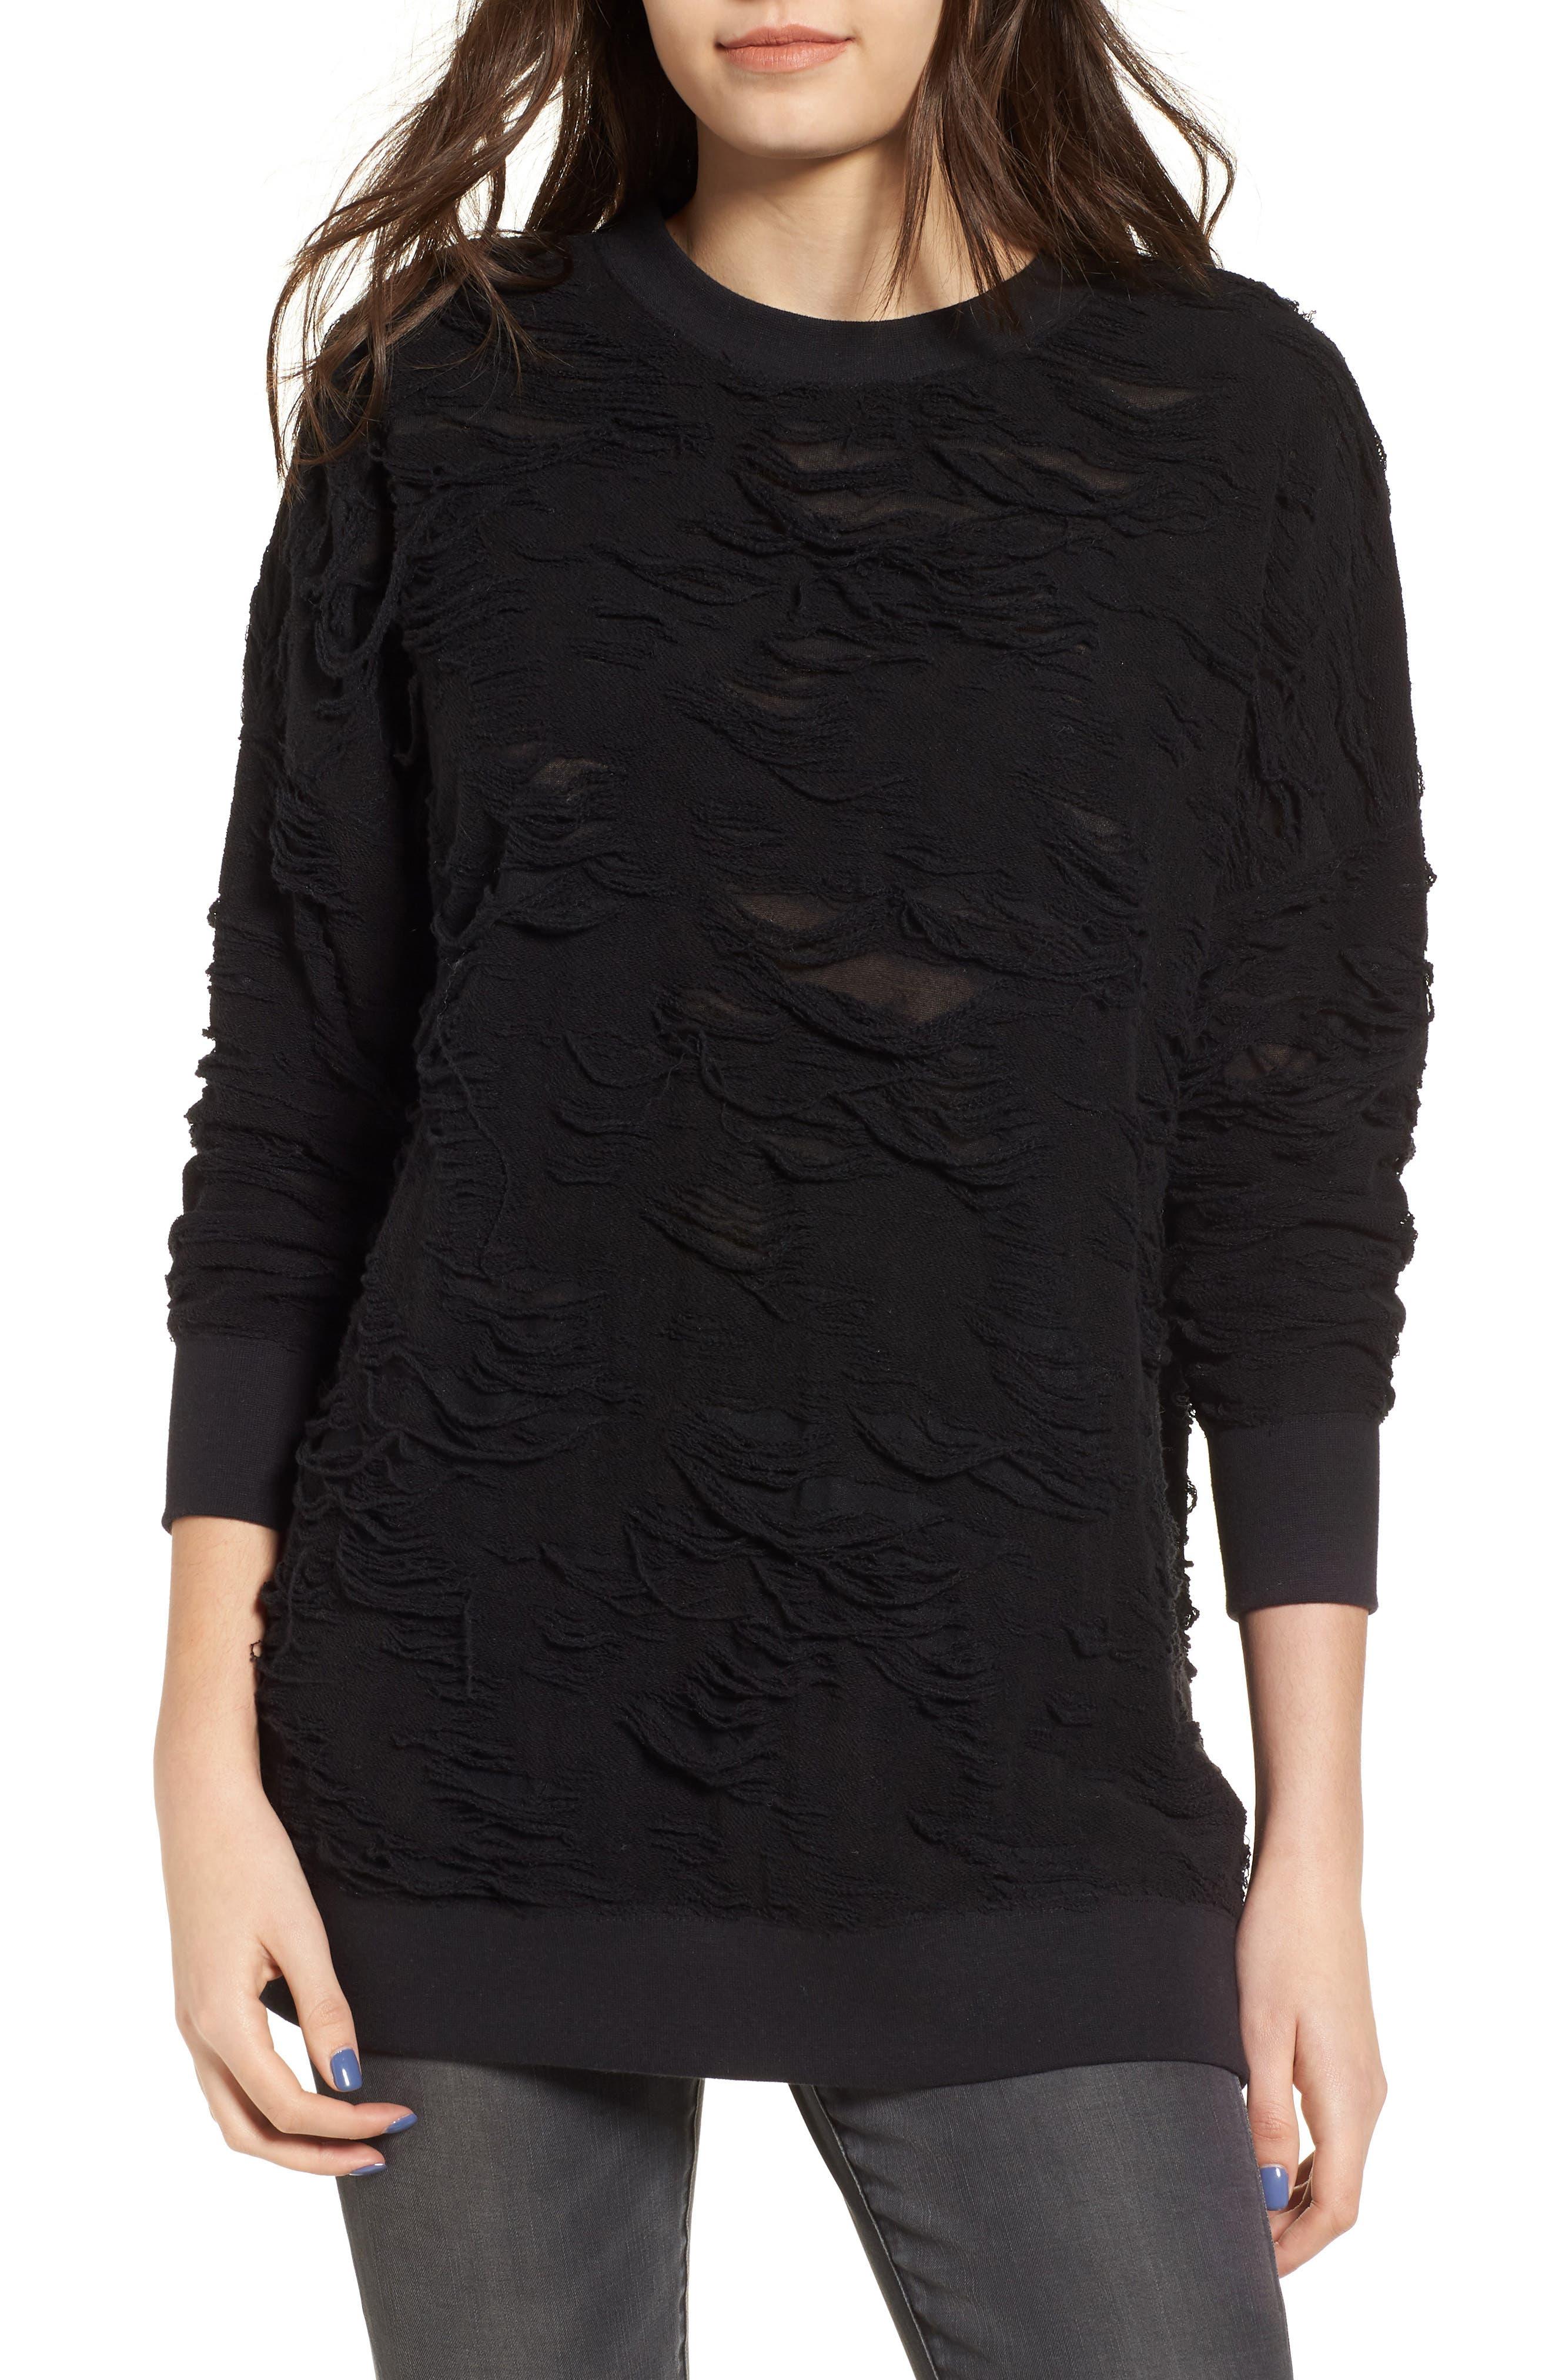 Me Too Slashed Sweatshirt,                             Main thumbnail 1, color,                             Black